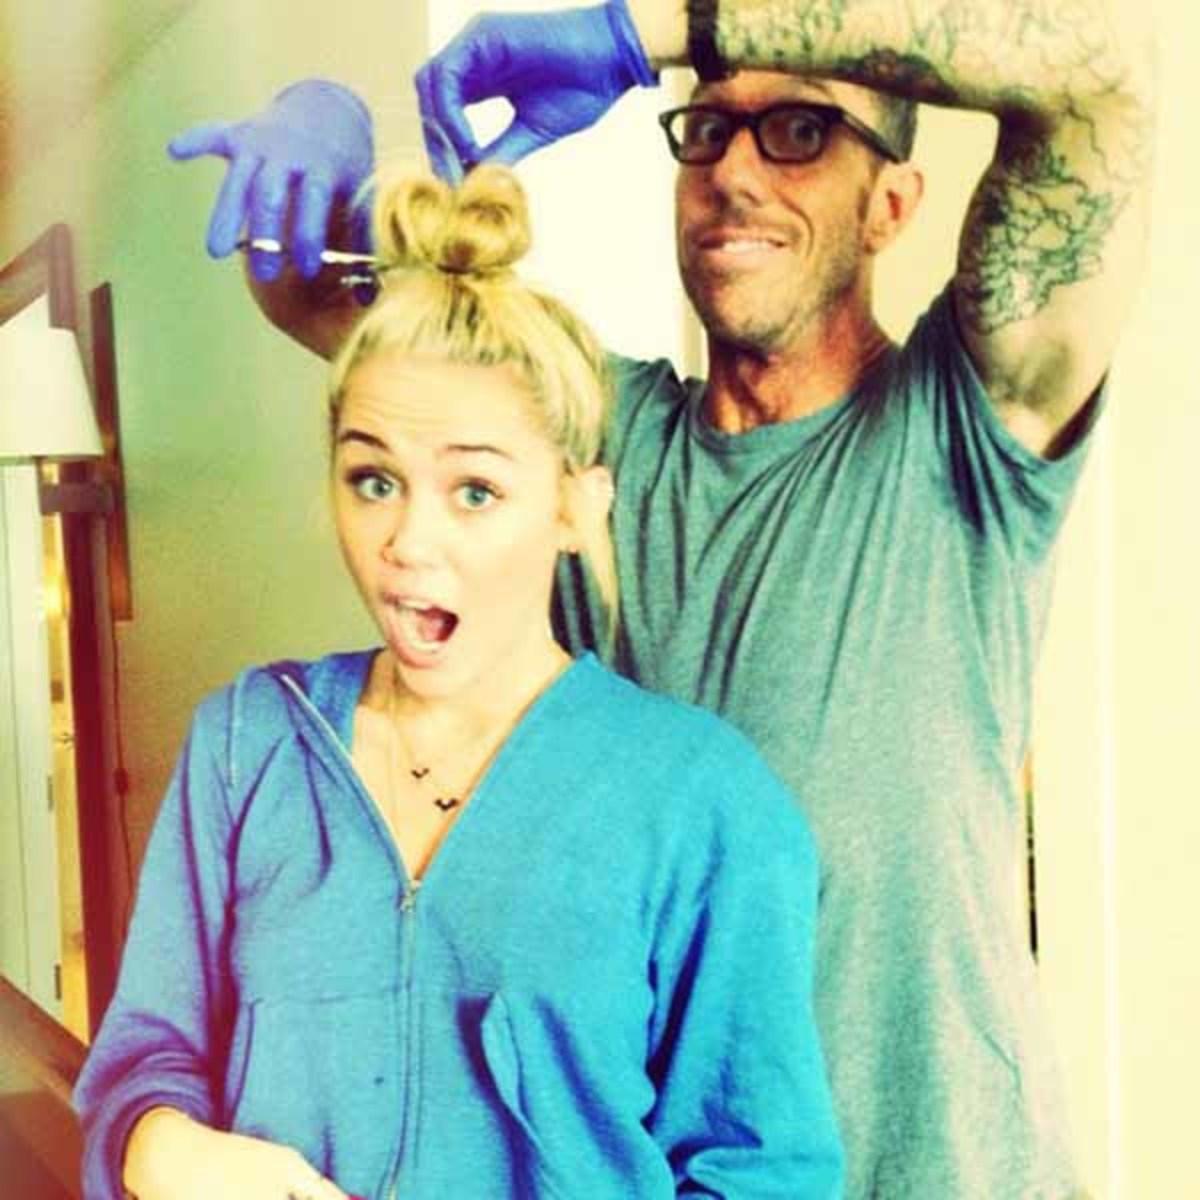 Miley Cyrus and Chris McMillan